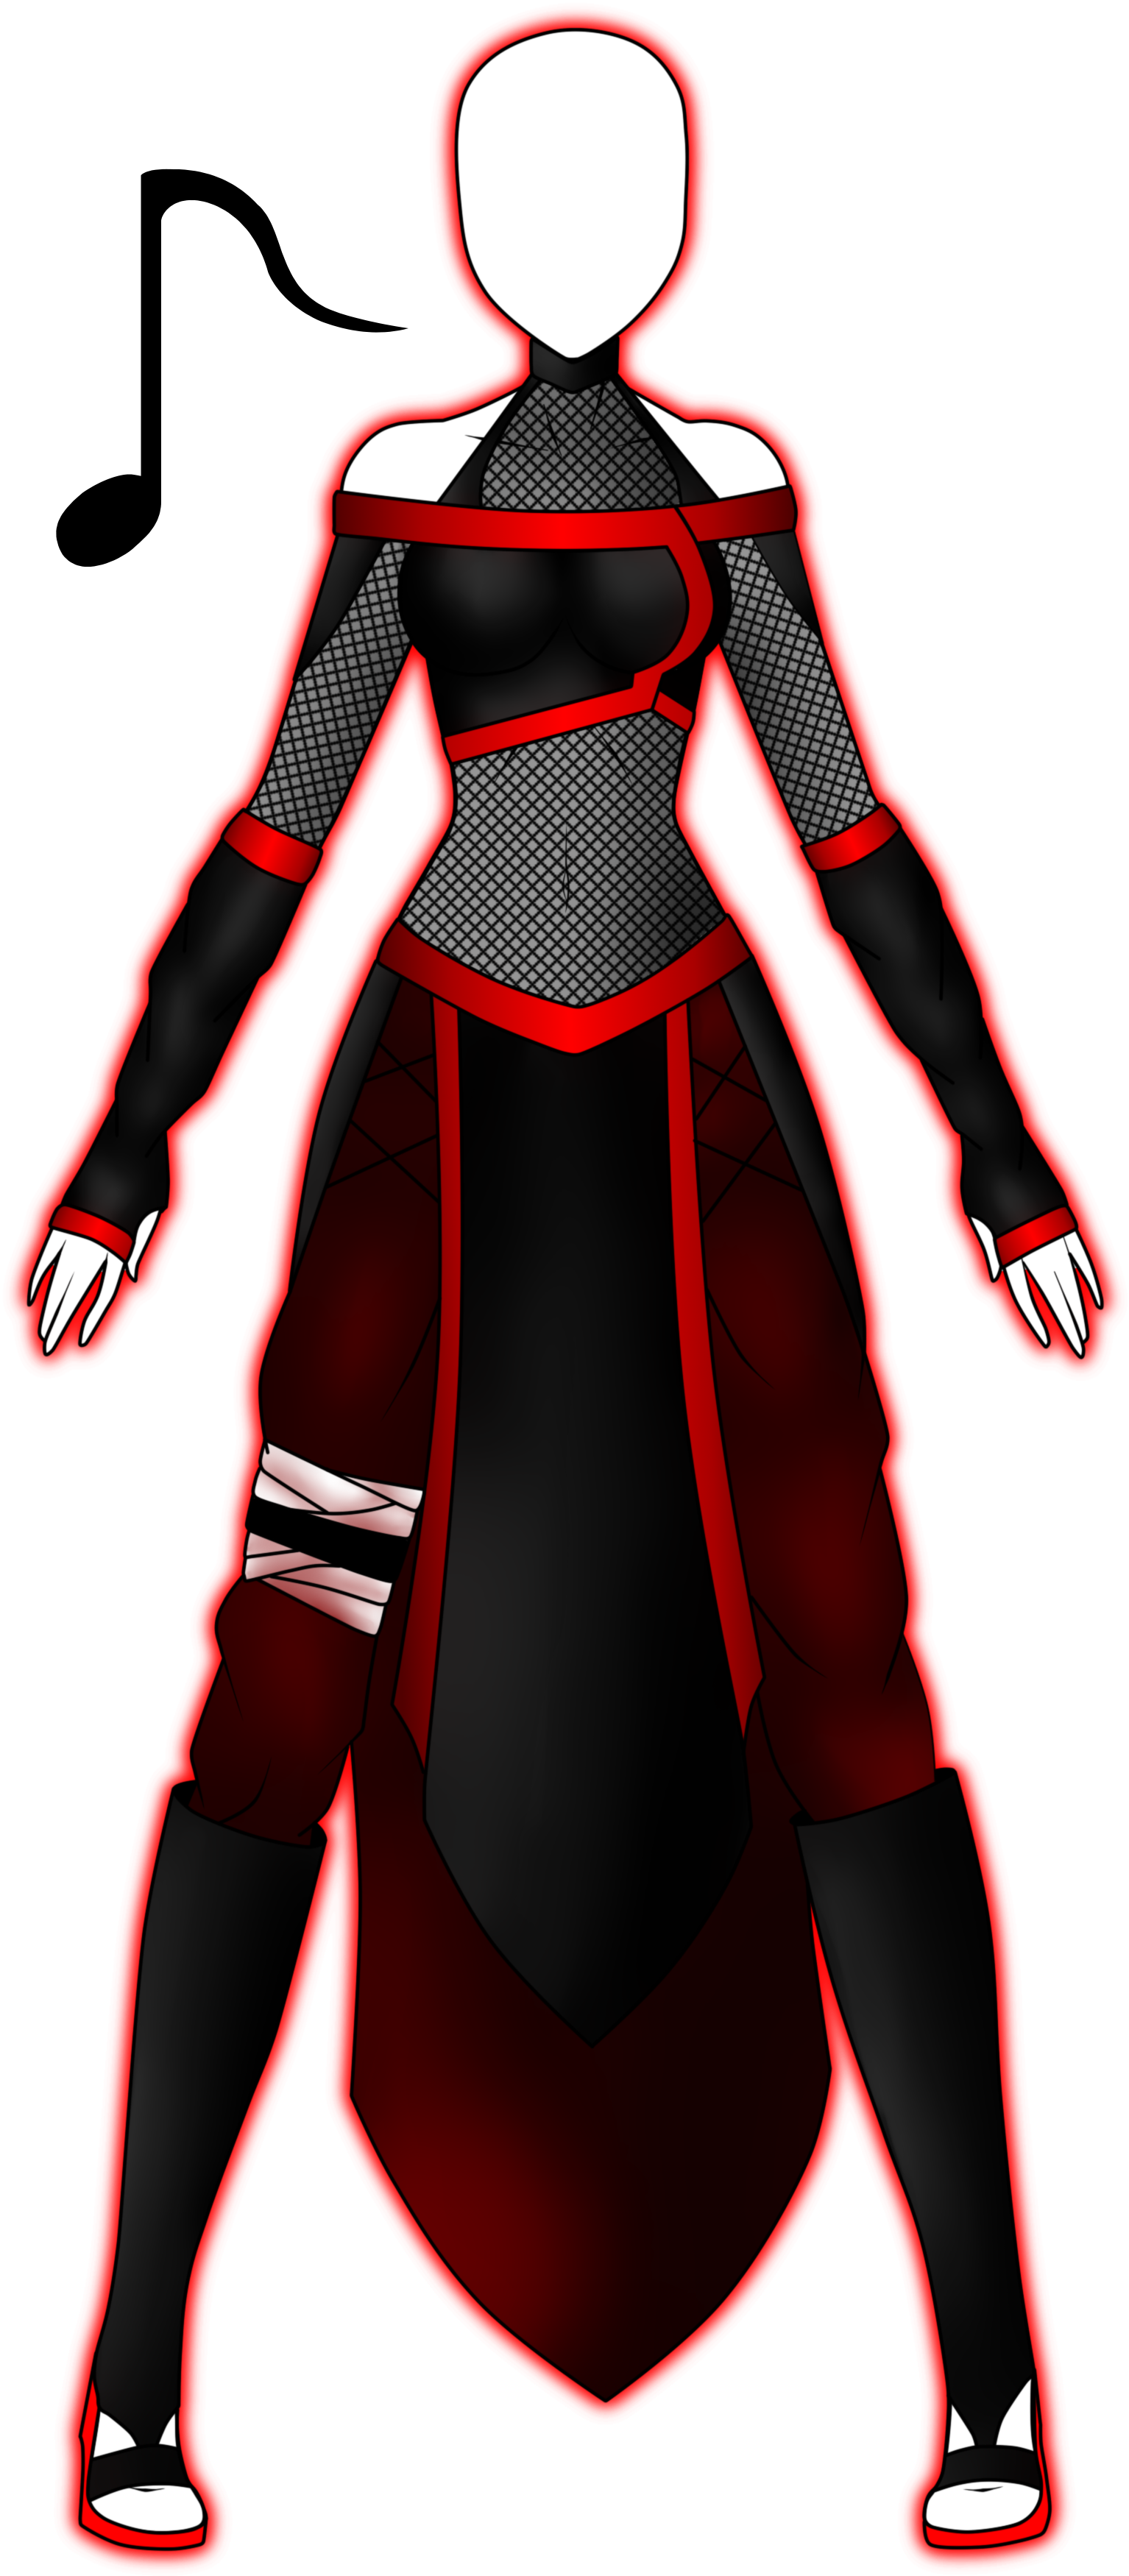 Vulkana's Naruto Outfit by 2050